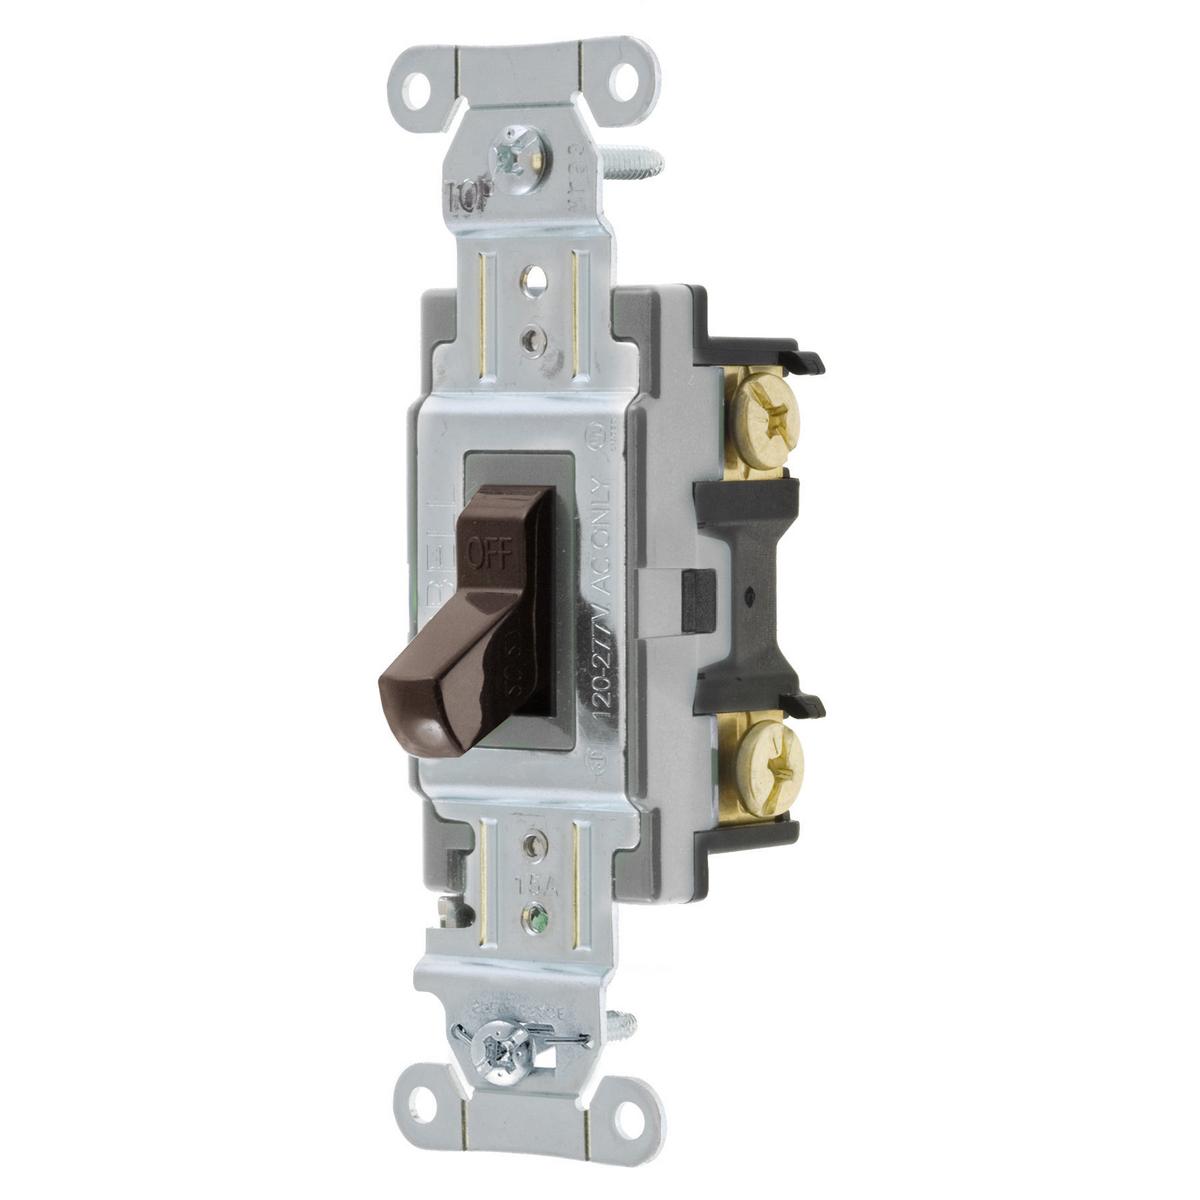 CS115 | Brand | Wiring Device - Kellems